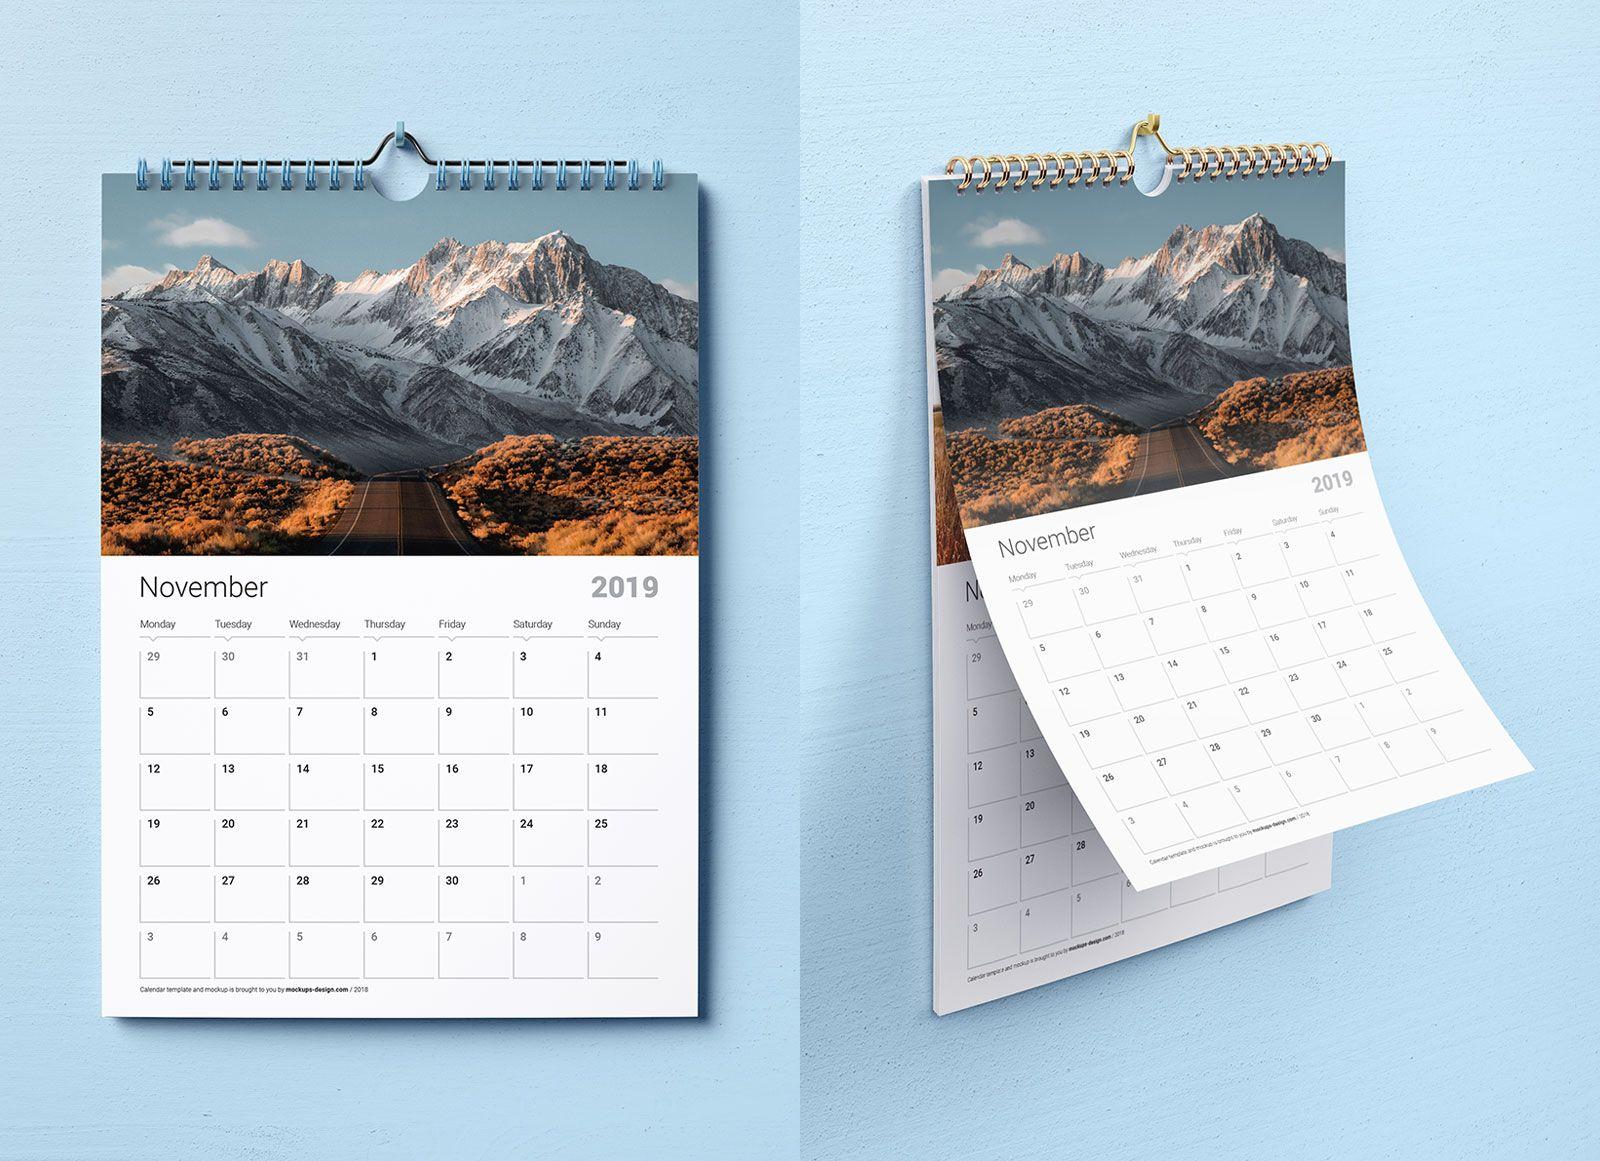 Free Premium Wall Calendar Mockup Psd Template Set 2019 Wall Calendar Design Wall Calendar Psd Templates